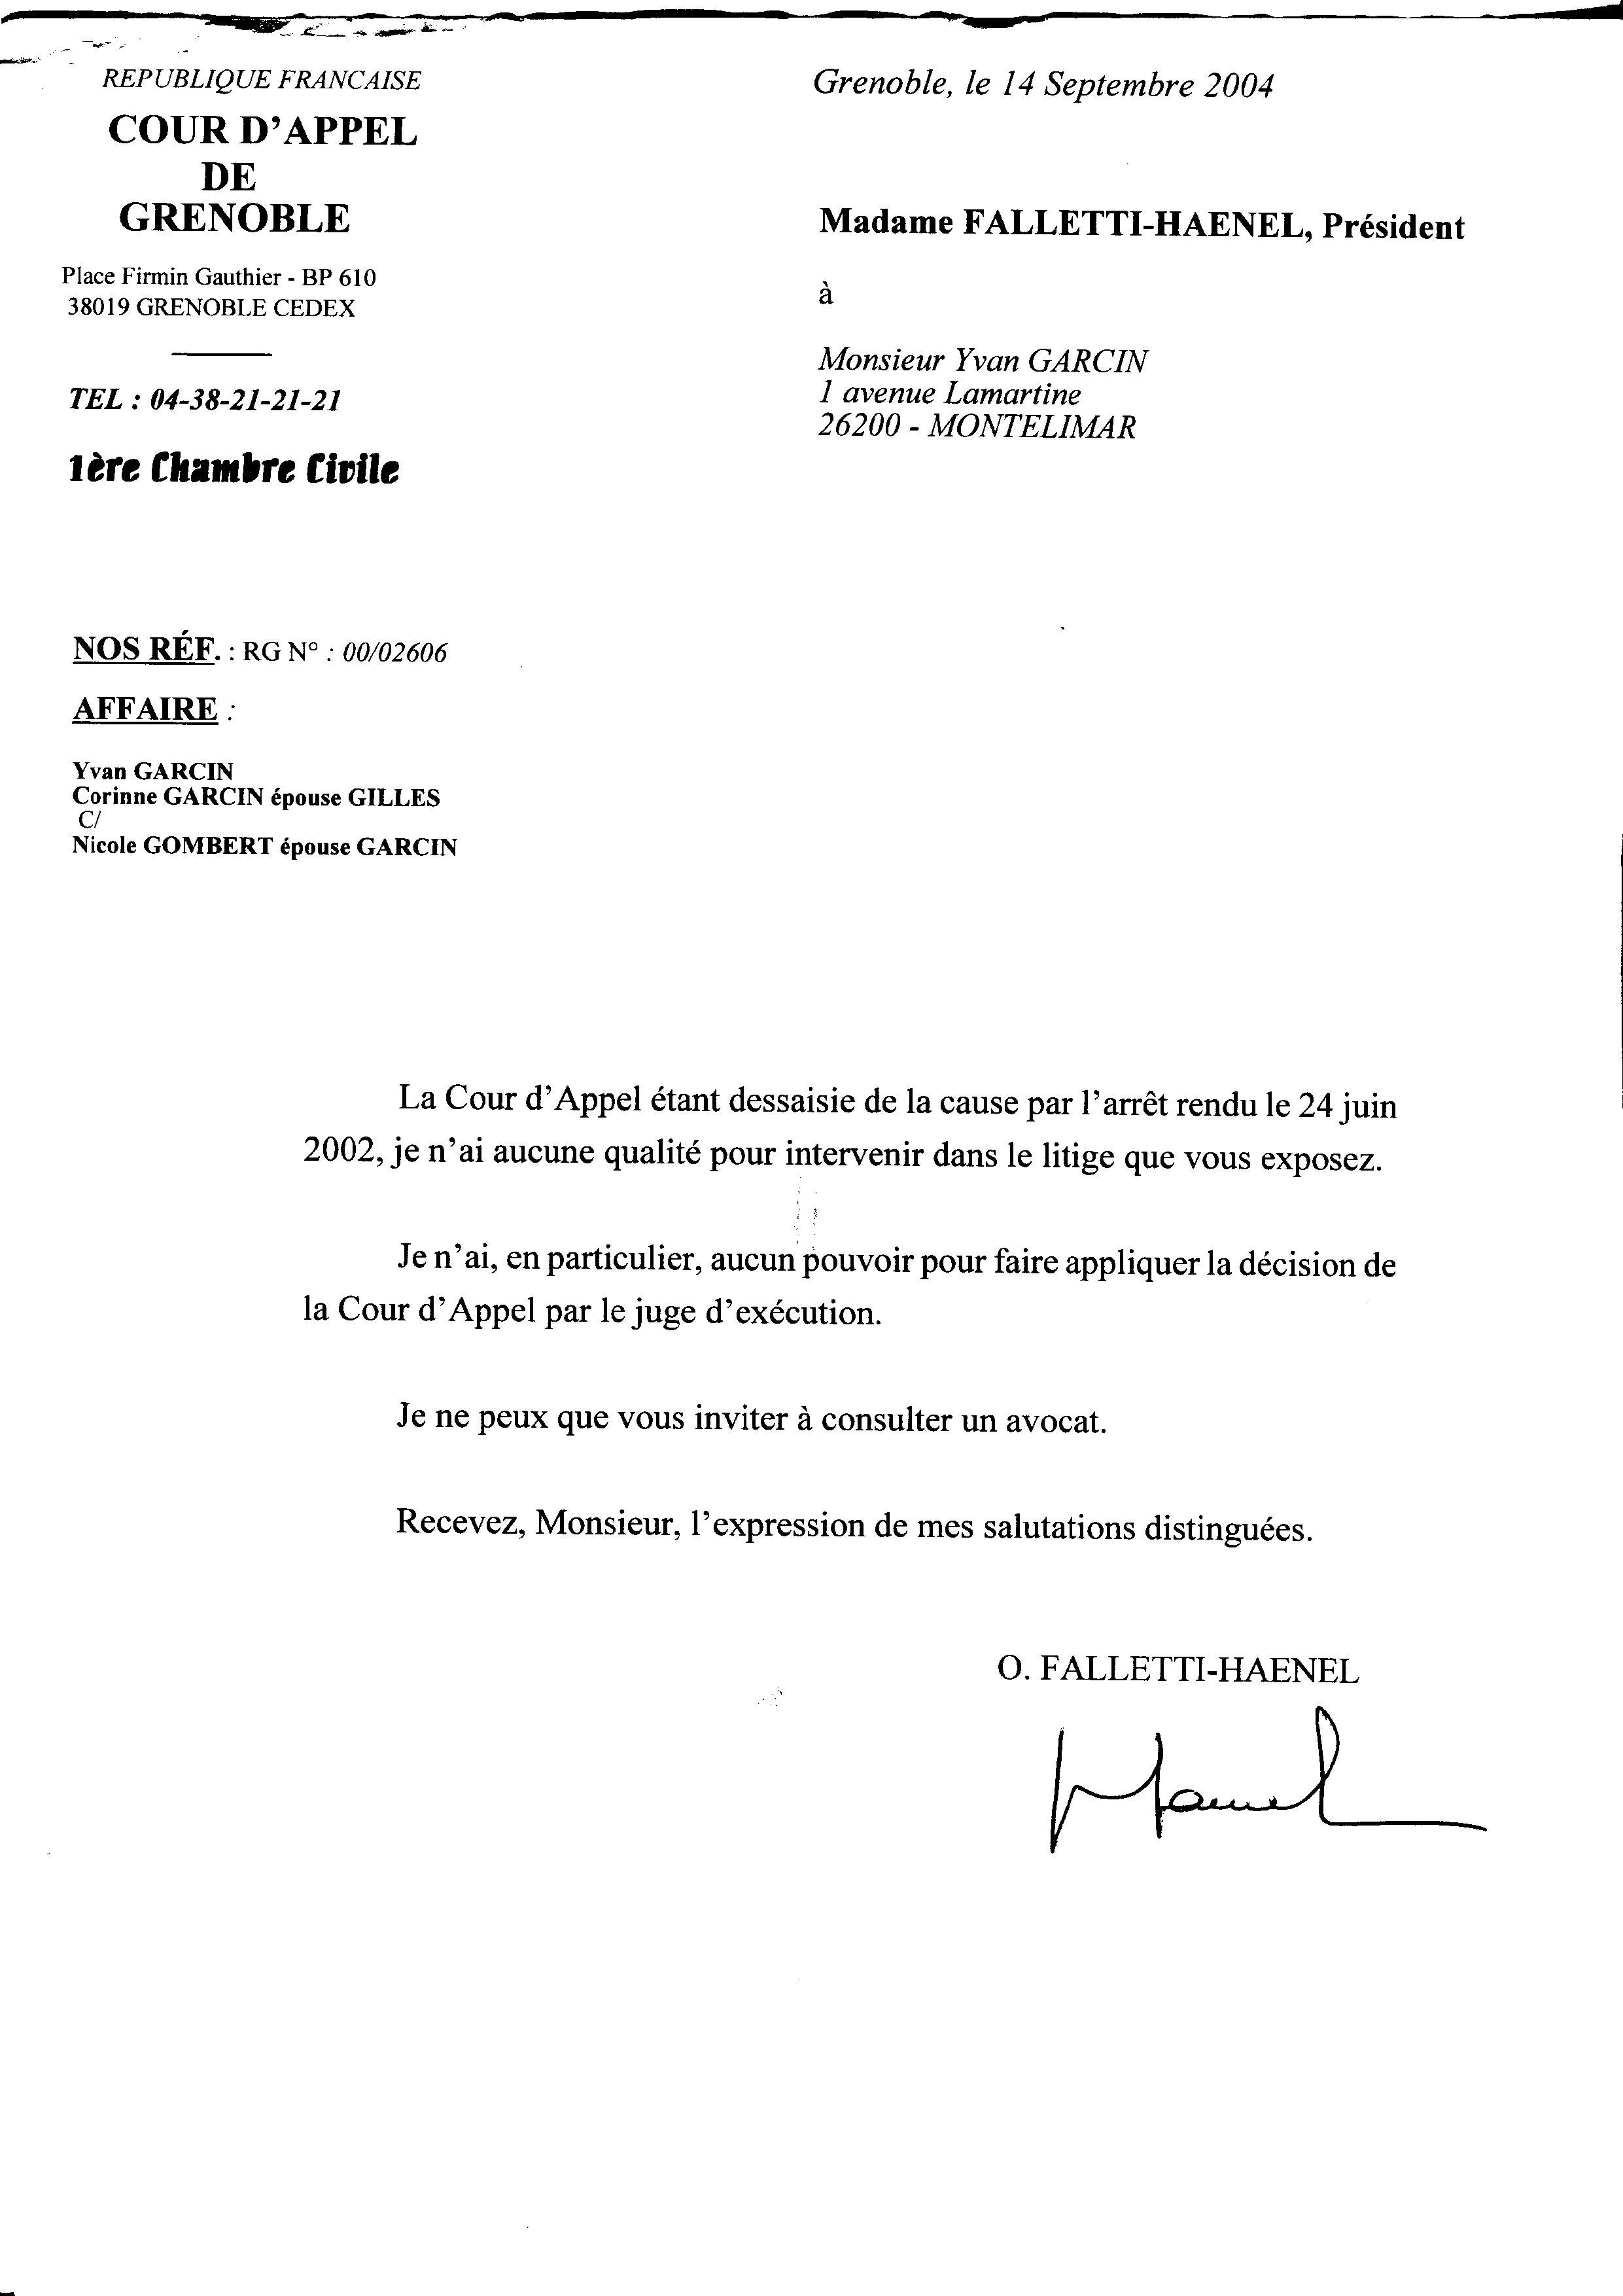 Courrier de Falletti-Haenel à Yvan Garcin du 14/09/2004